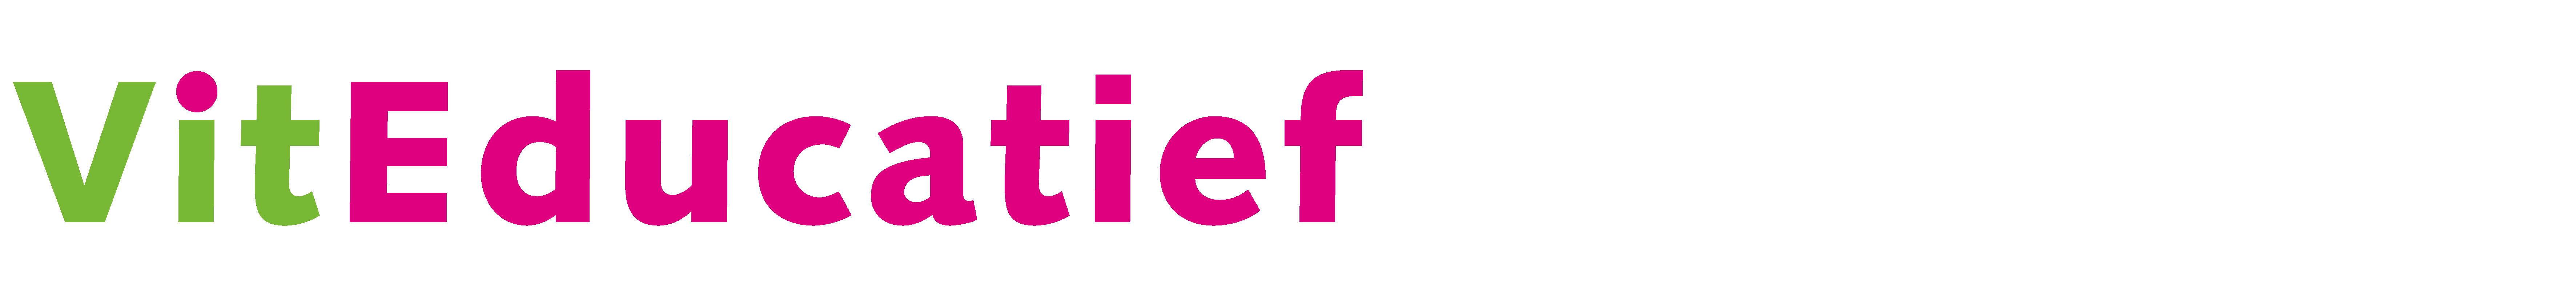 VitEducatief logo